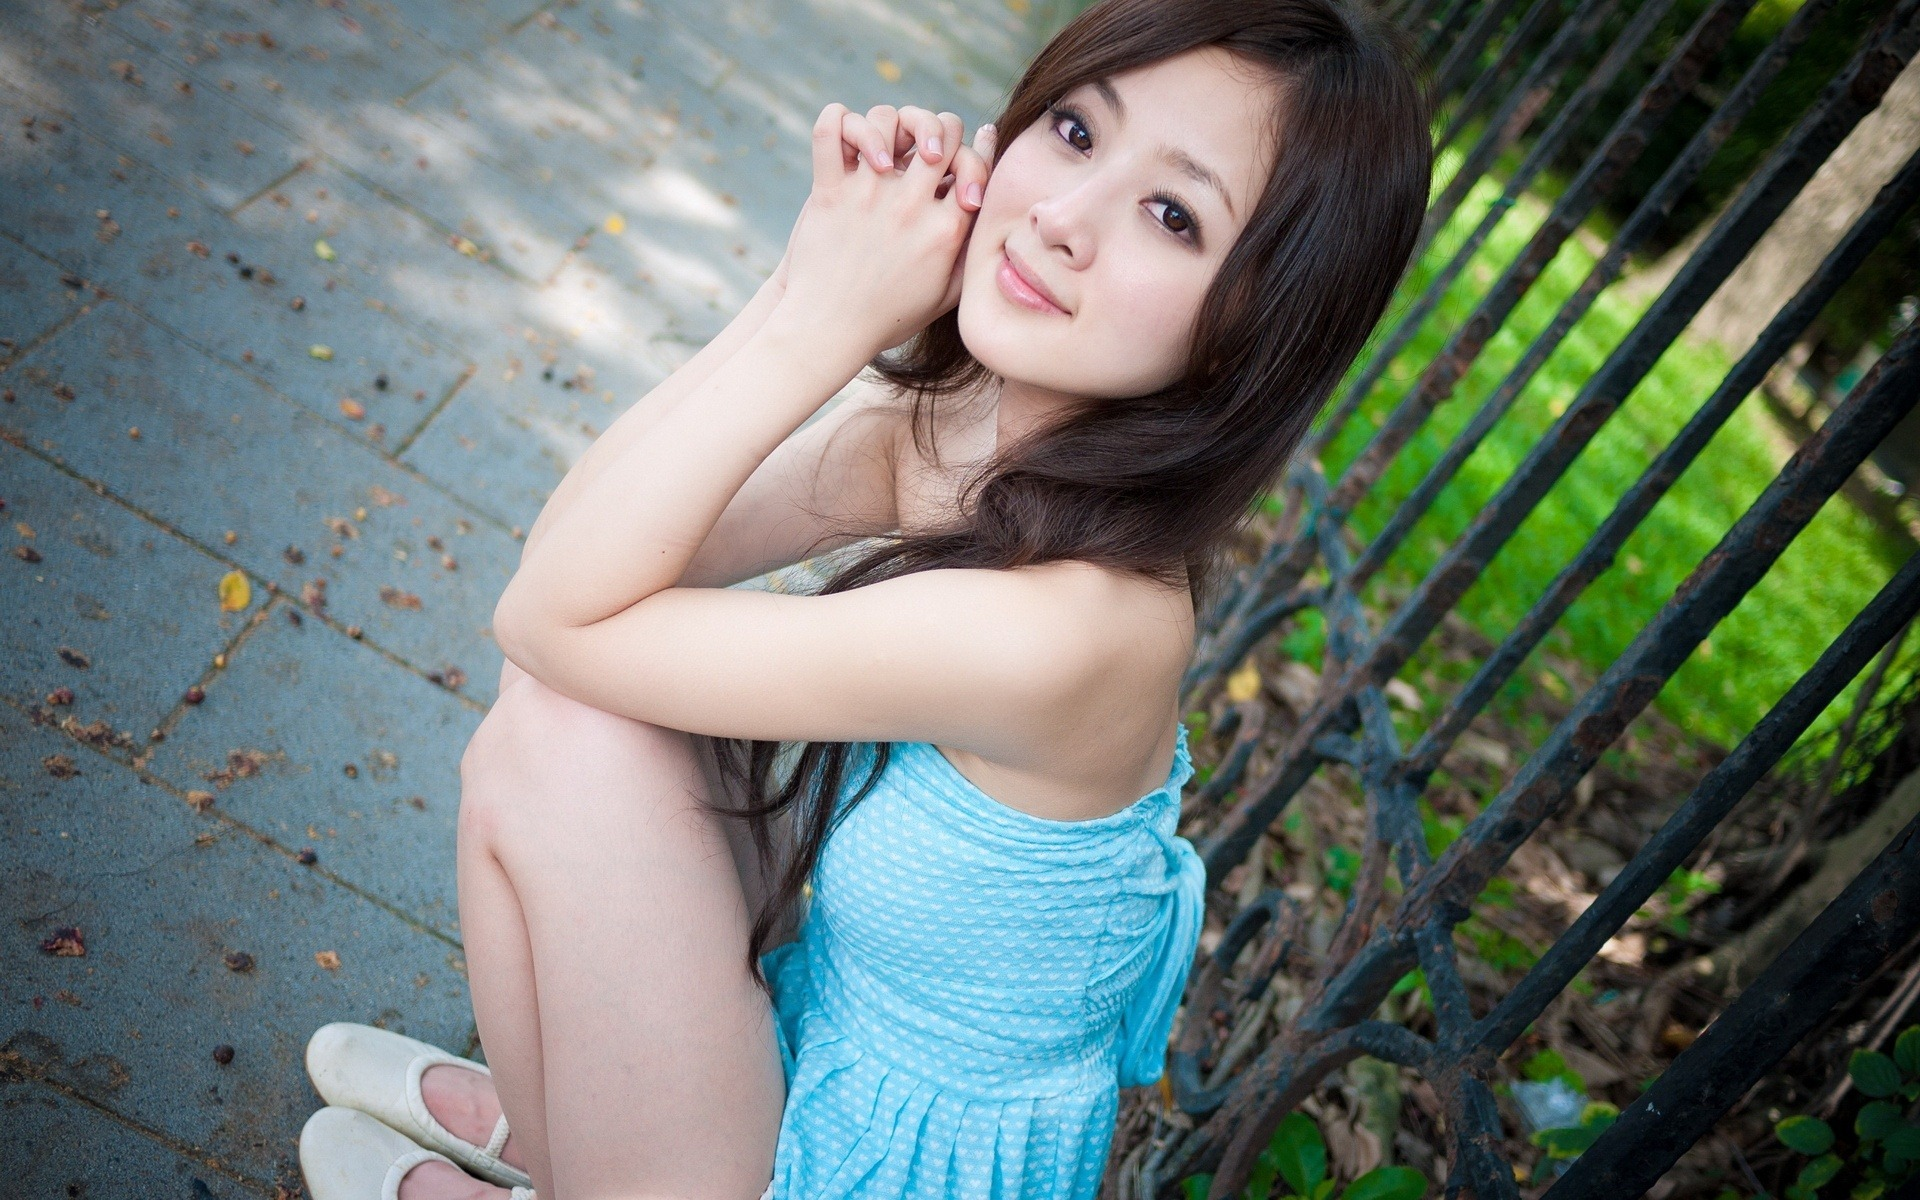 taiwan beaufiful girl mikako - photo #18